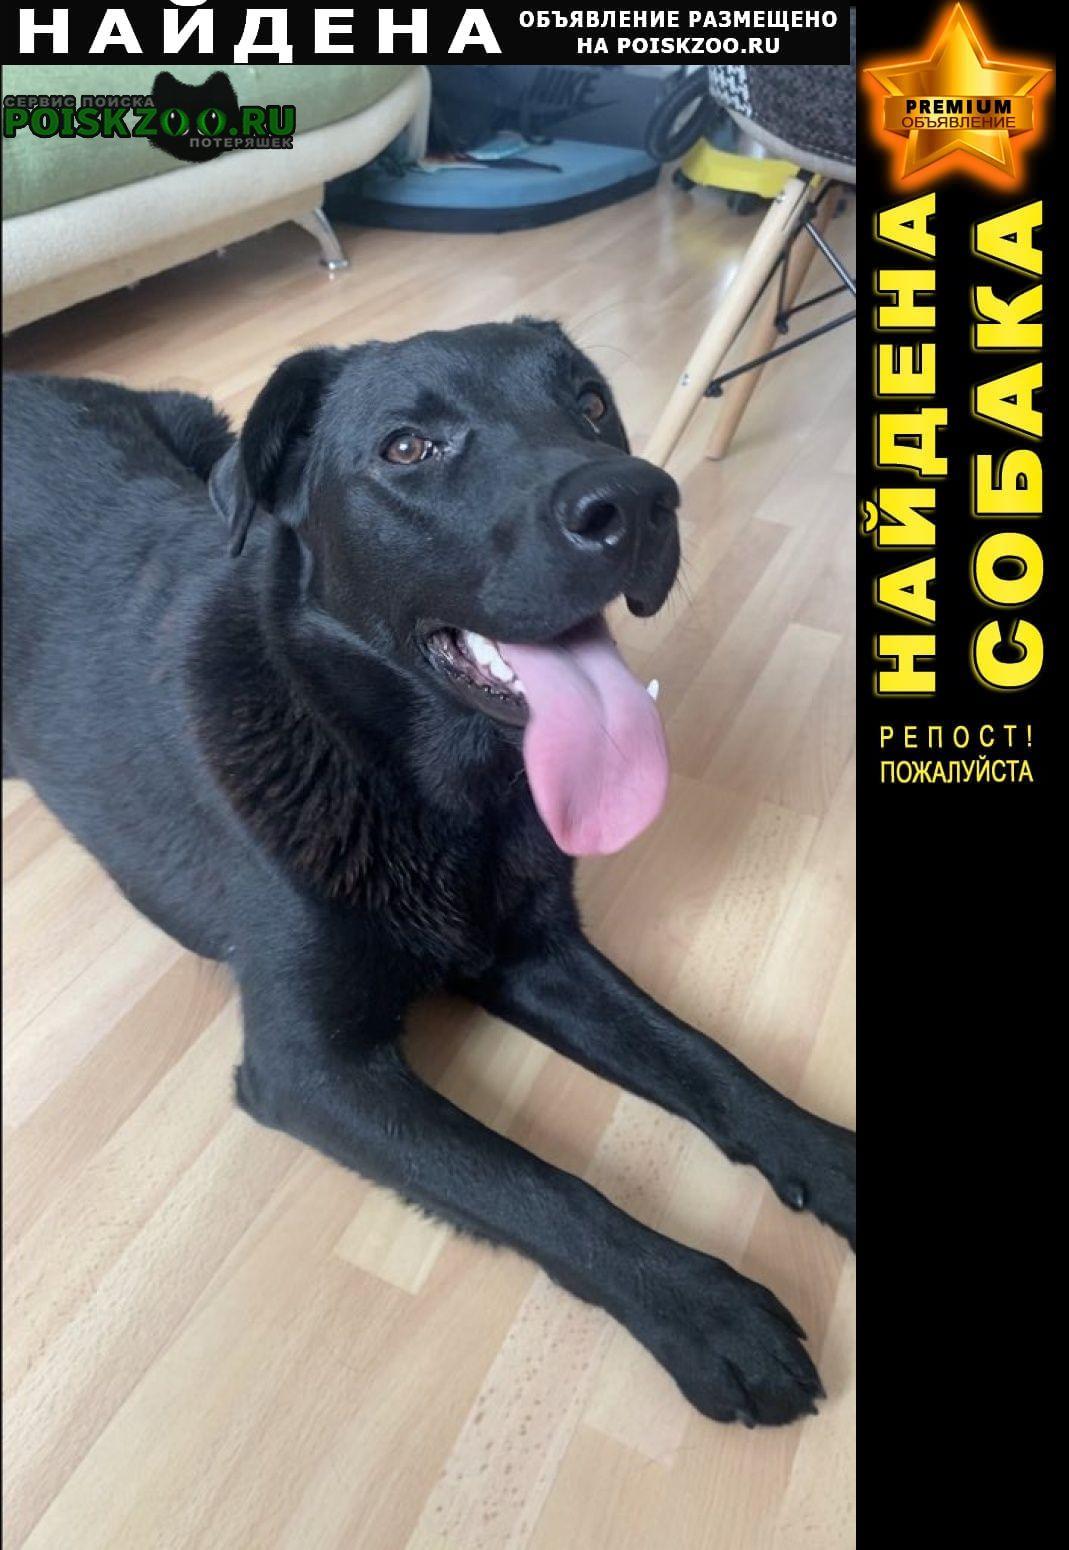 Найдена собака метис лабрадора Москва